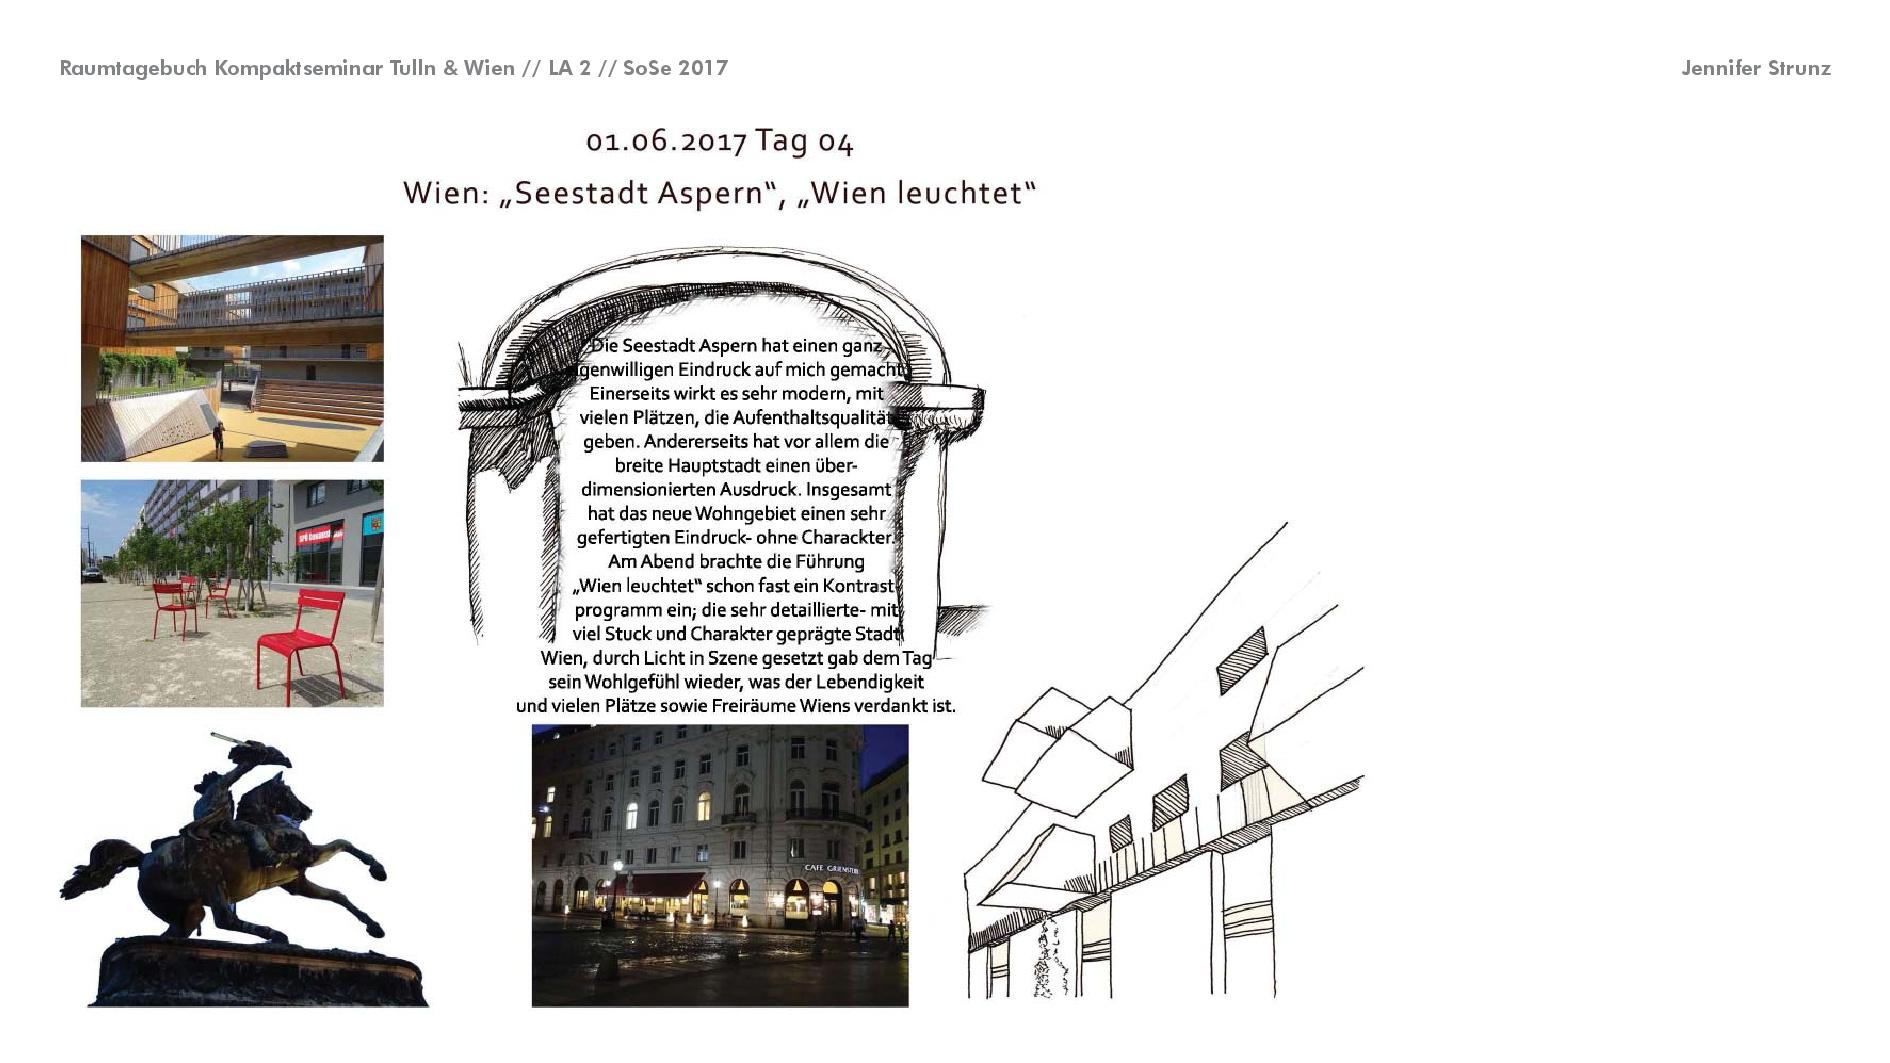 NEU Screen Raumtagebuch Tulln Wien SoSe 17 030